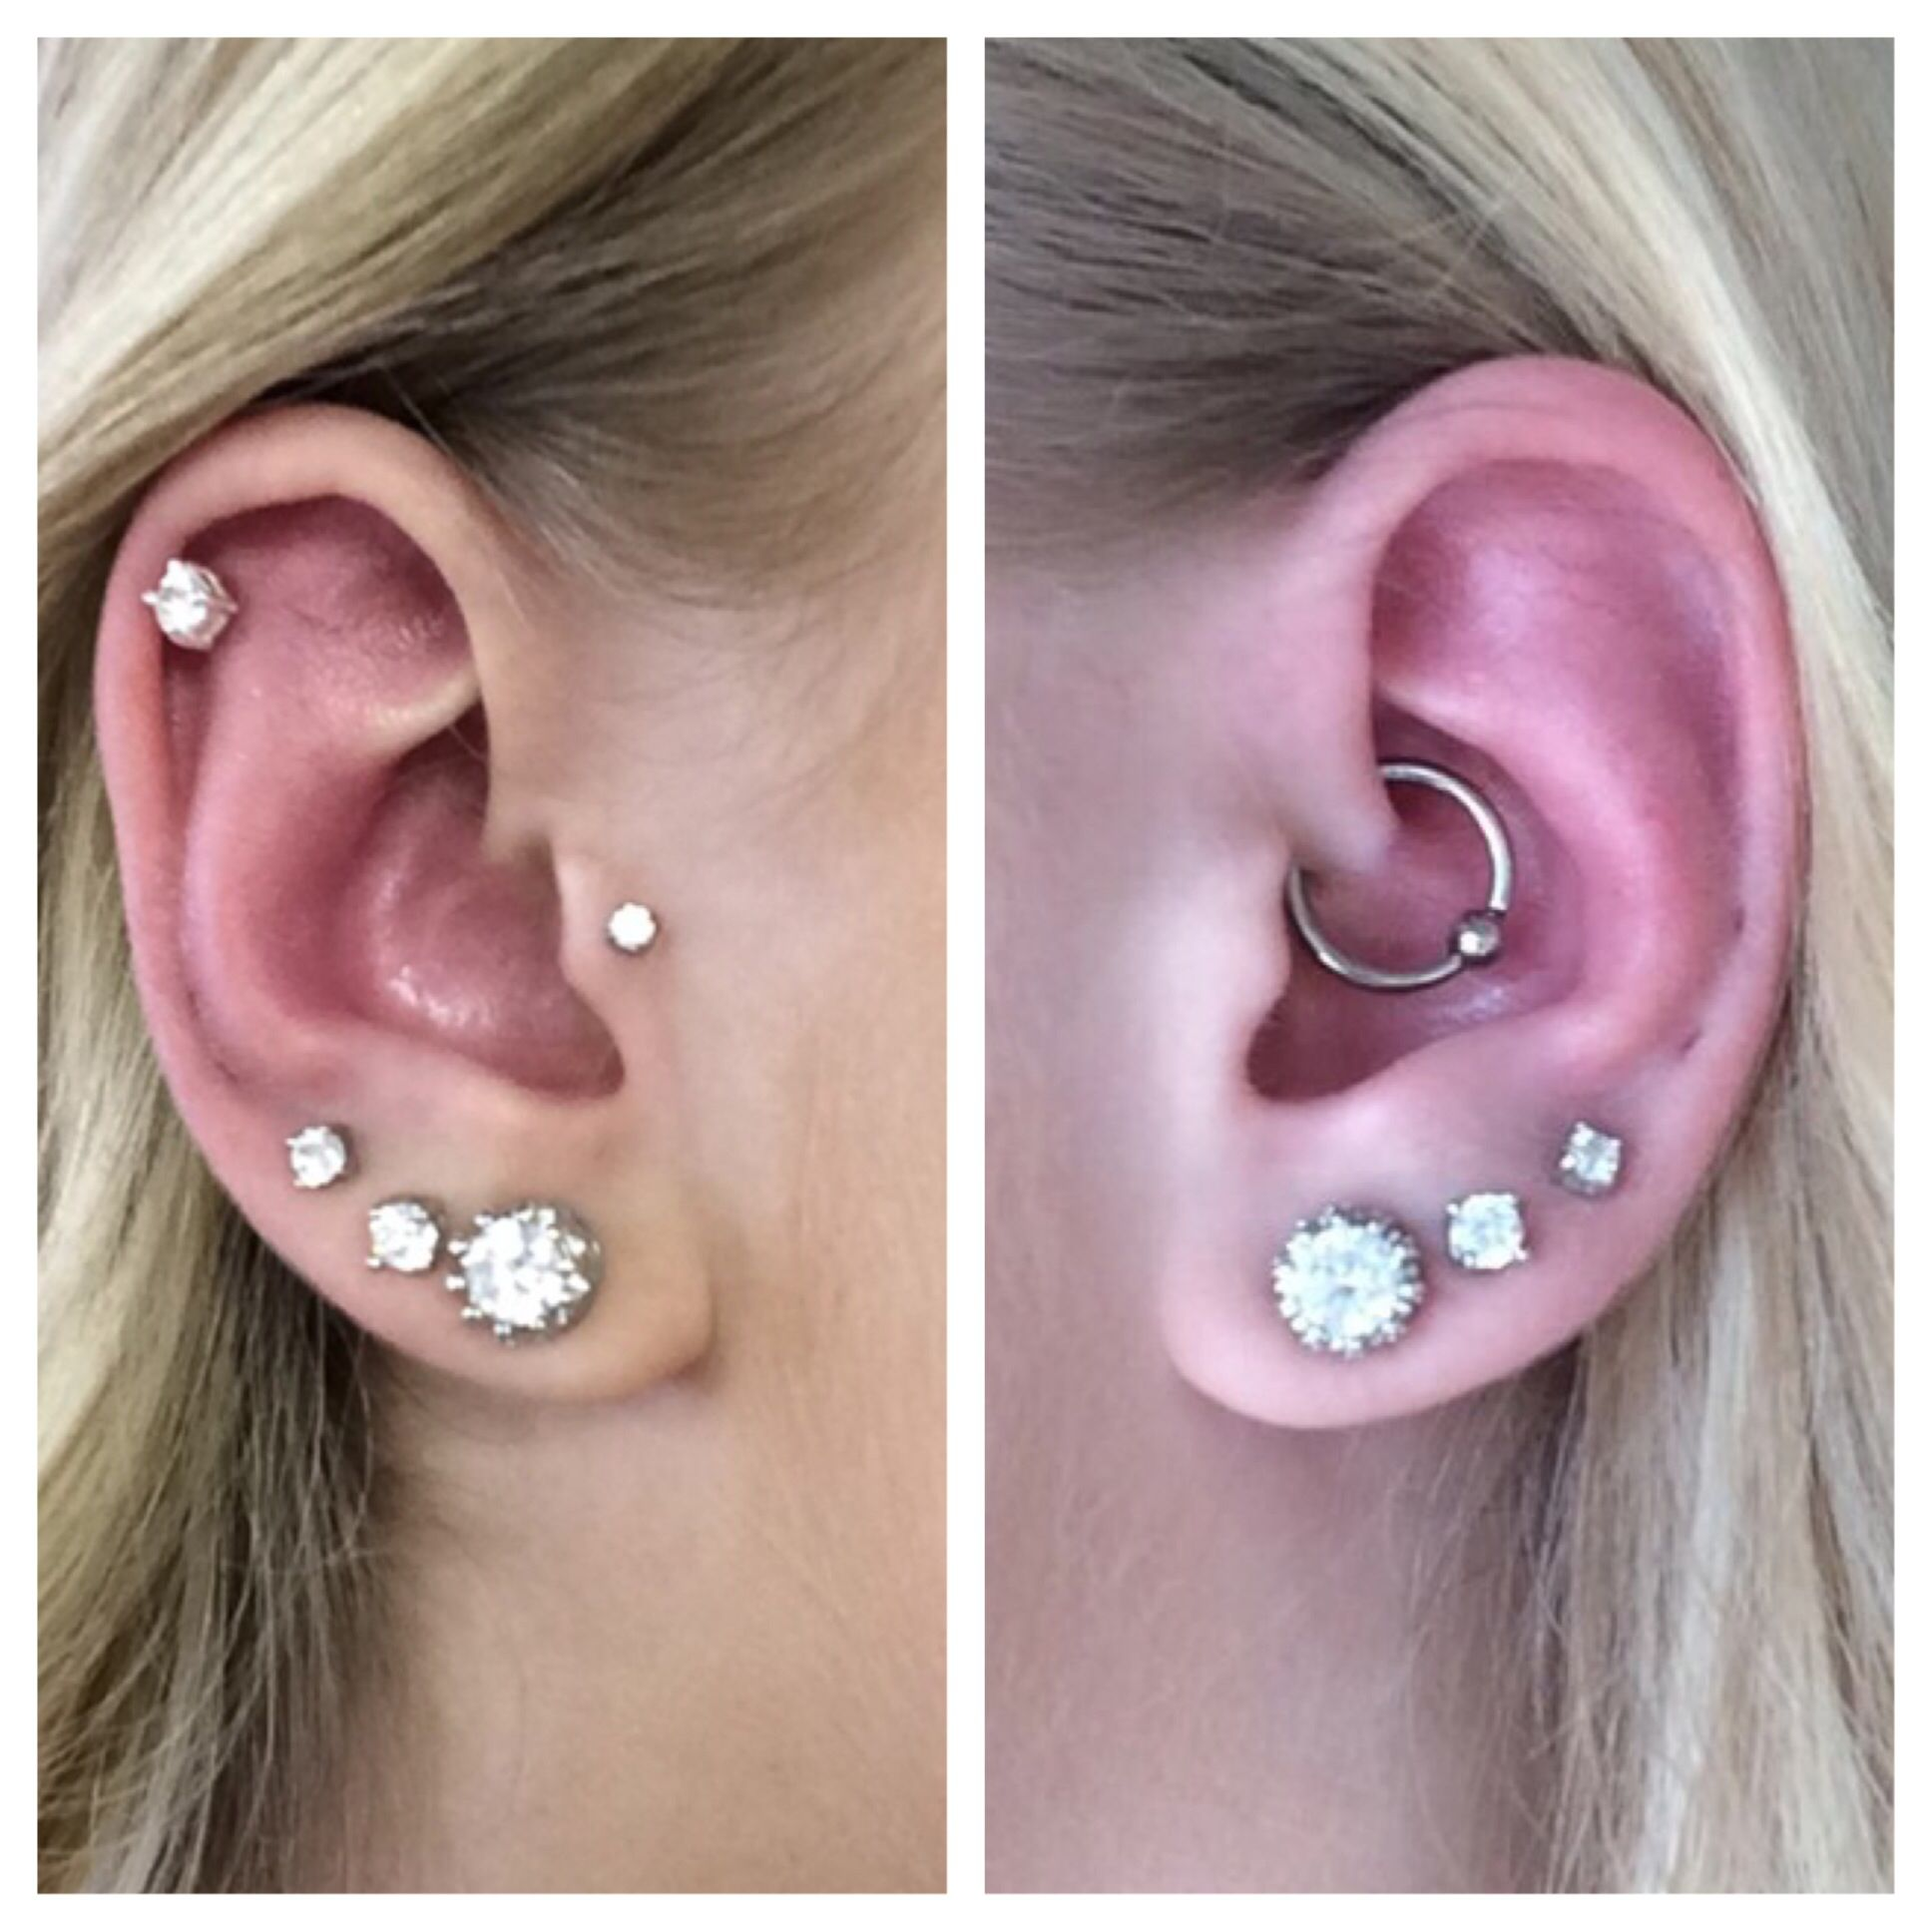 bcaa84091 Left ear: Triple lobe, Tragus and helix Right ear: Triple lobe, Daith  Pierced at Jaded Soul Living art in Gresham, OR